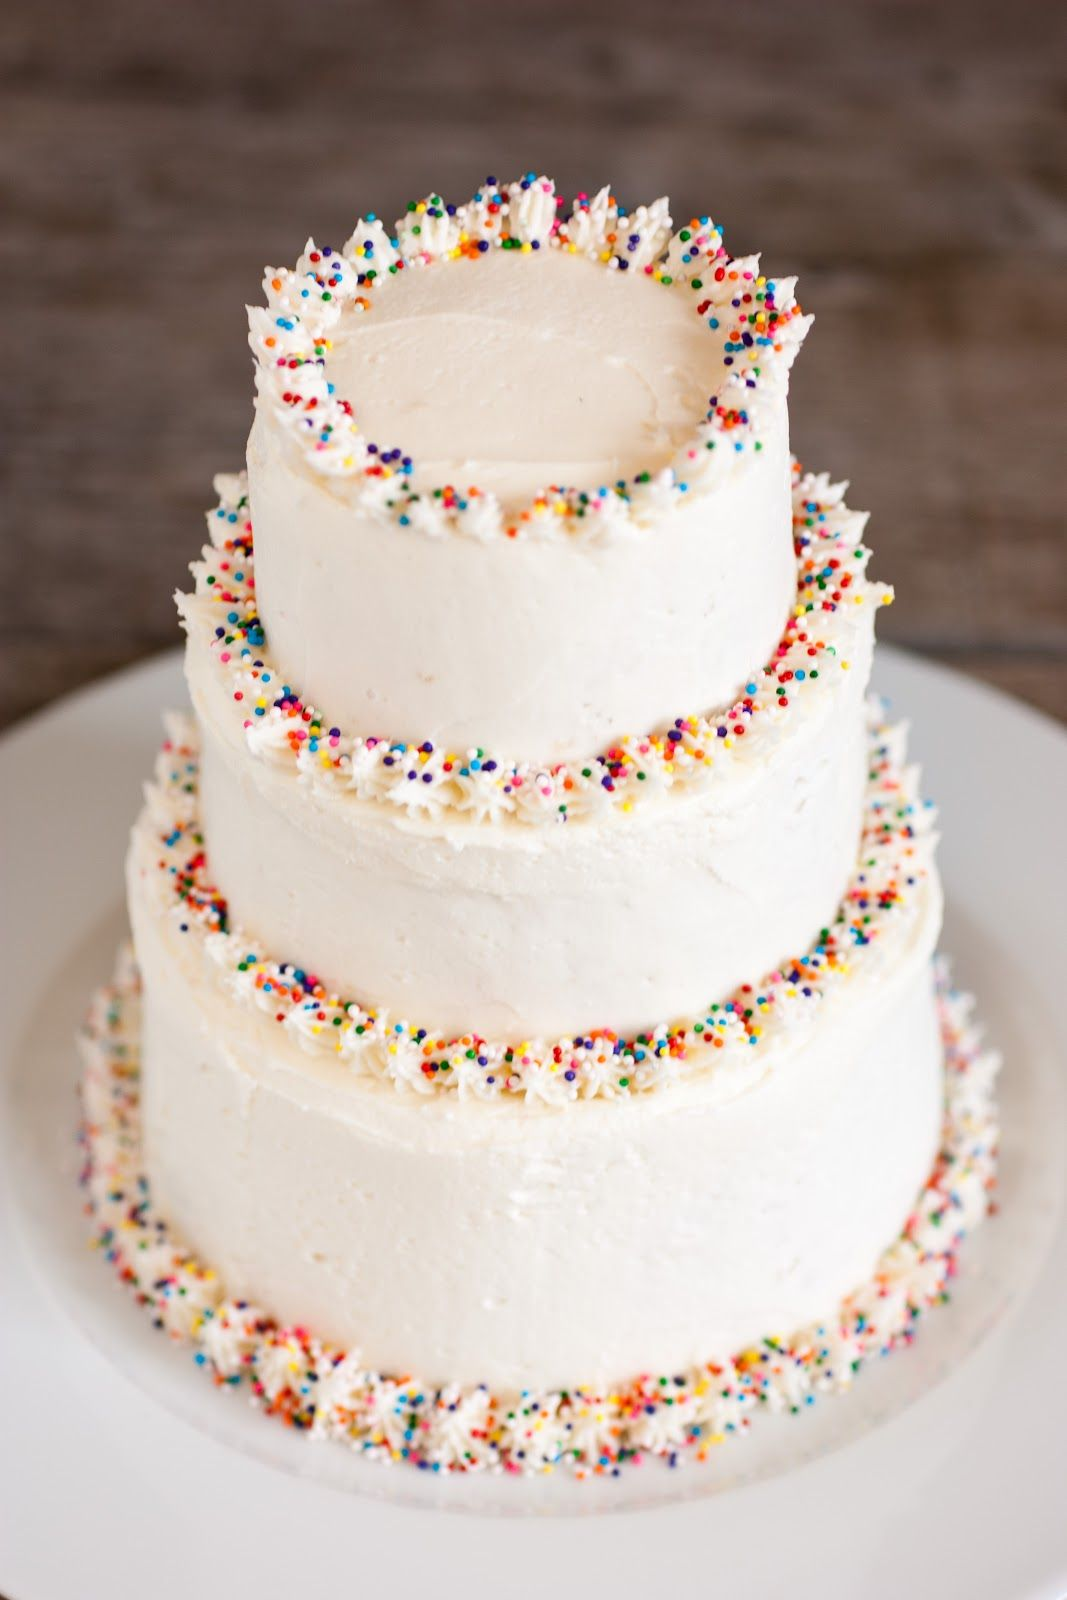 Vanilla wedding cake icing recipe